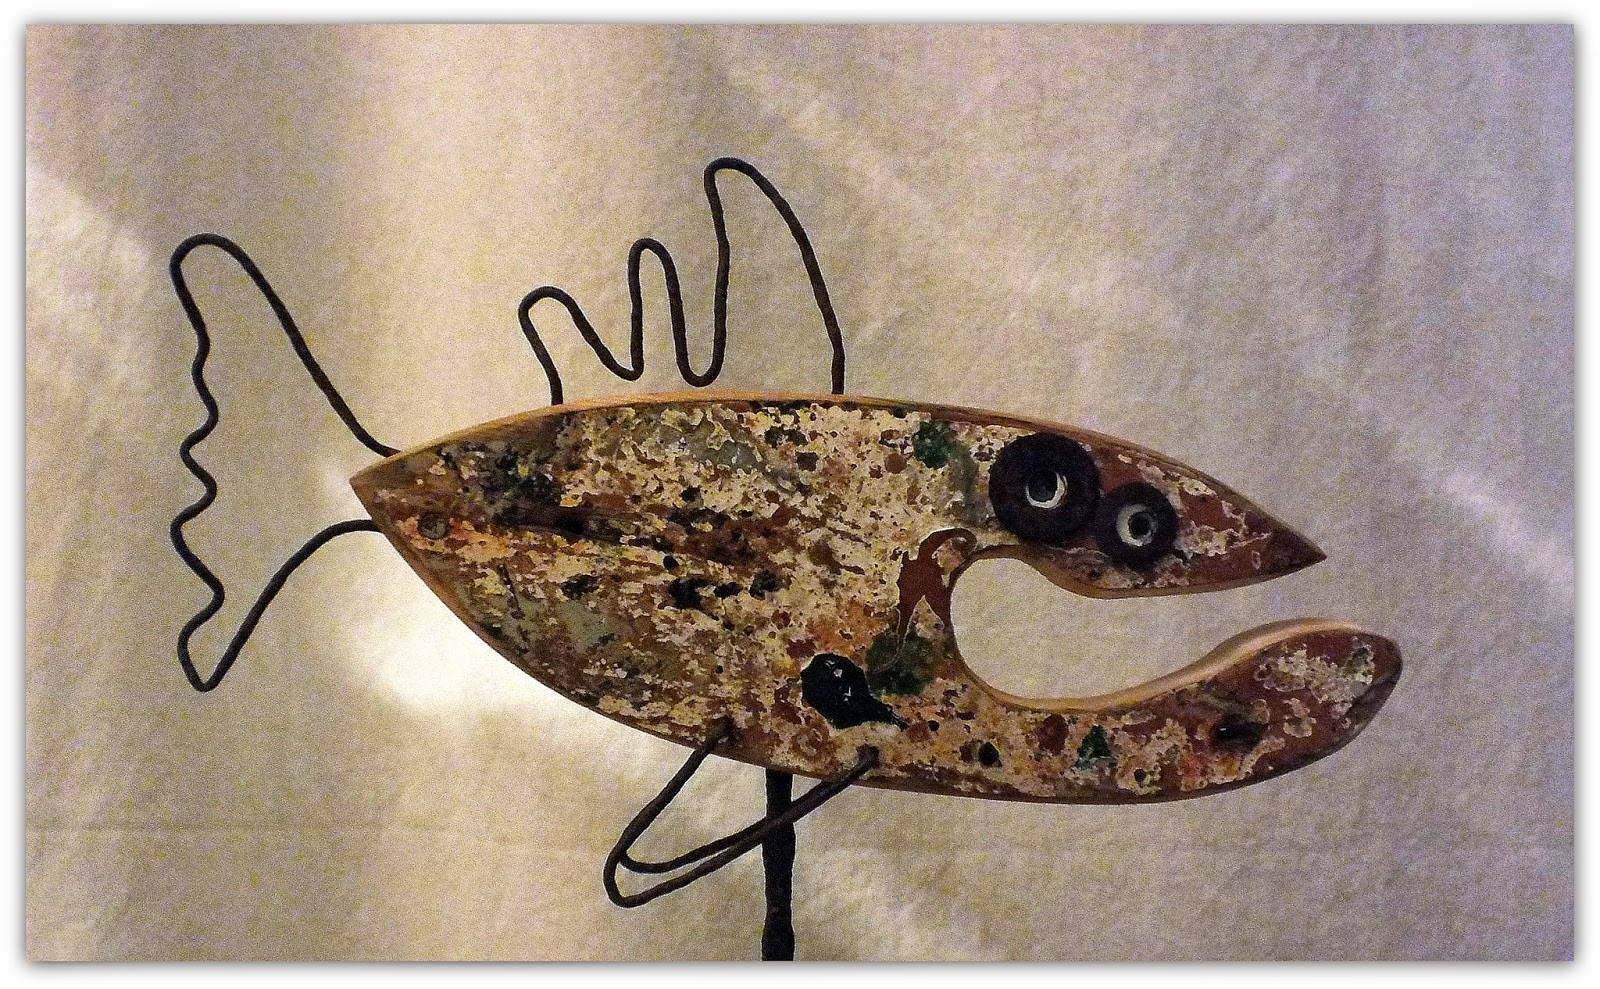 O\'Fishl, poisson en bois flotté et métal, réversible !